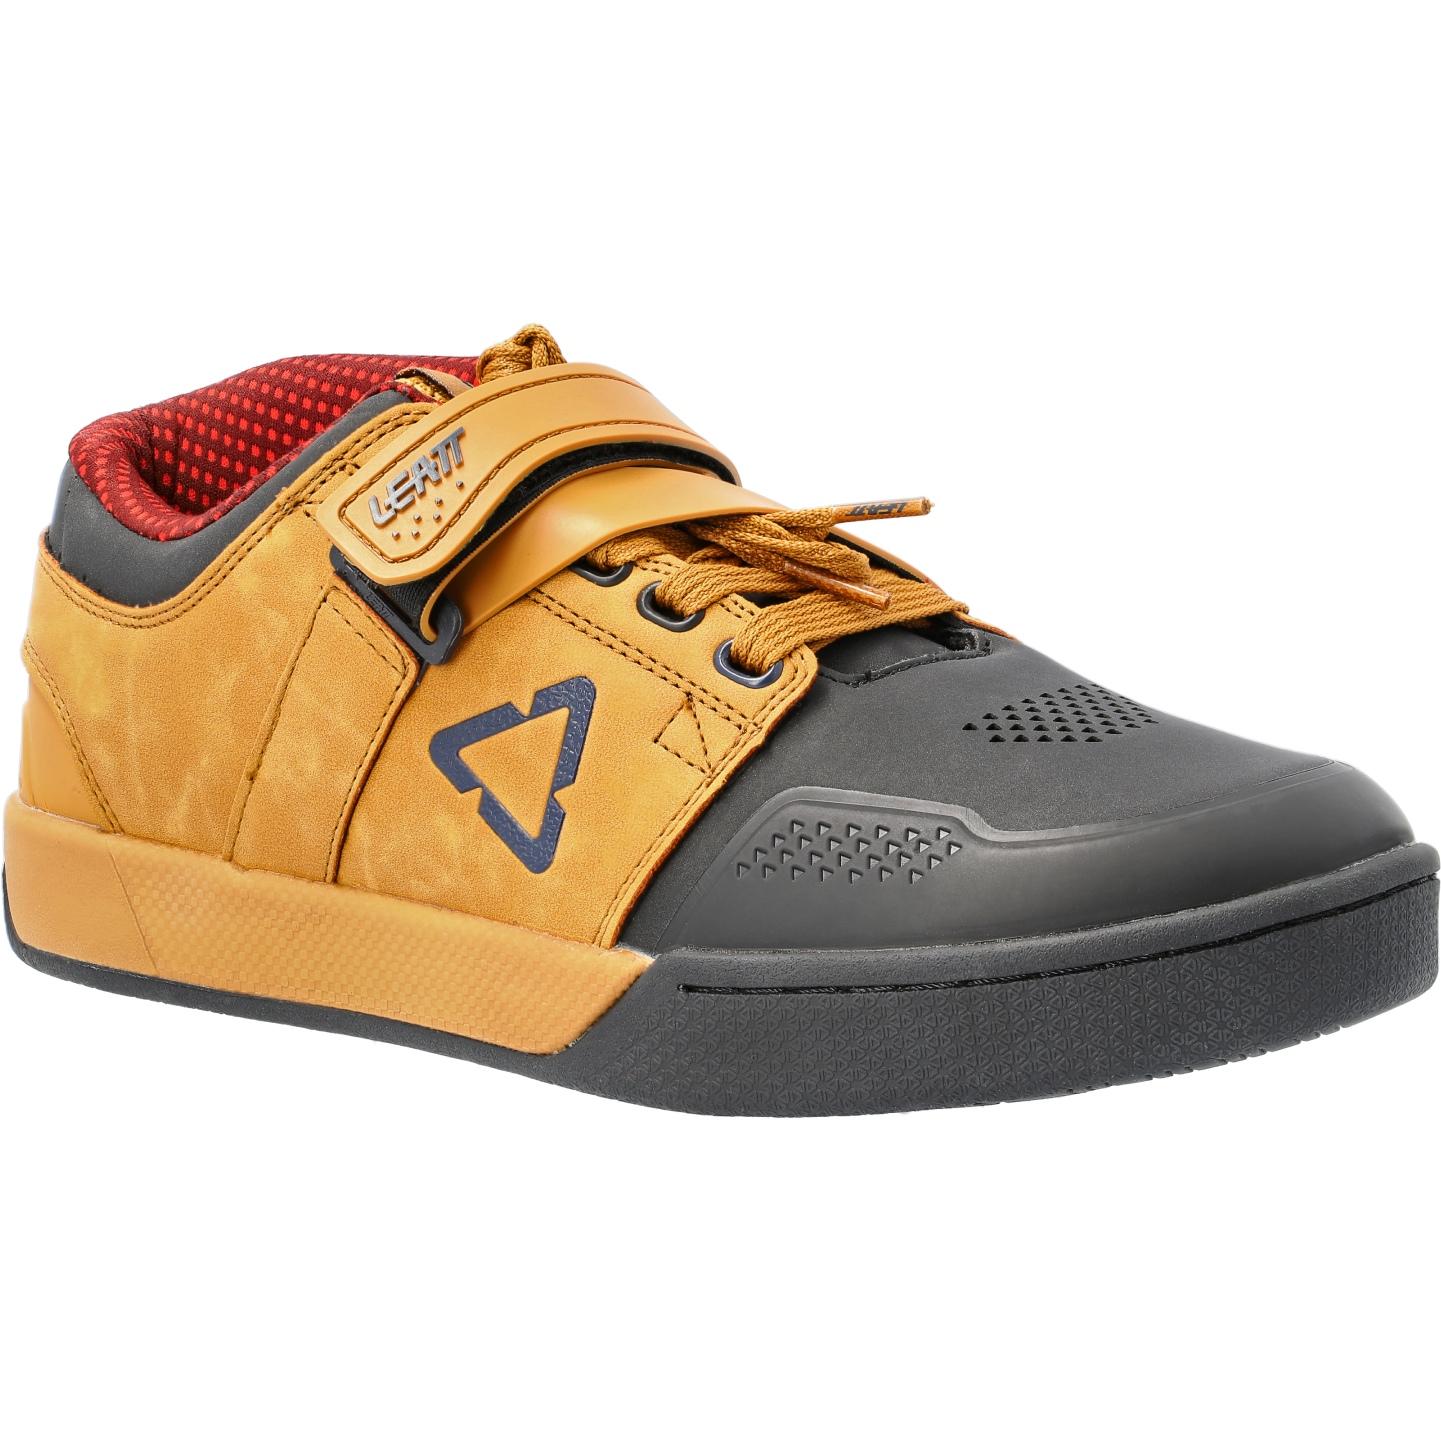 Leatt DBX 4.0 Clip Shoe - sand